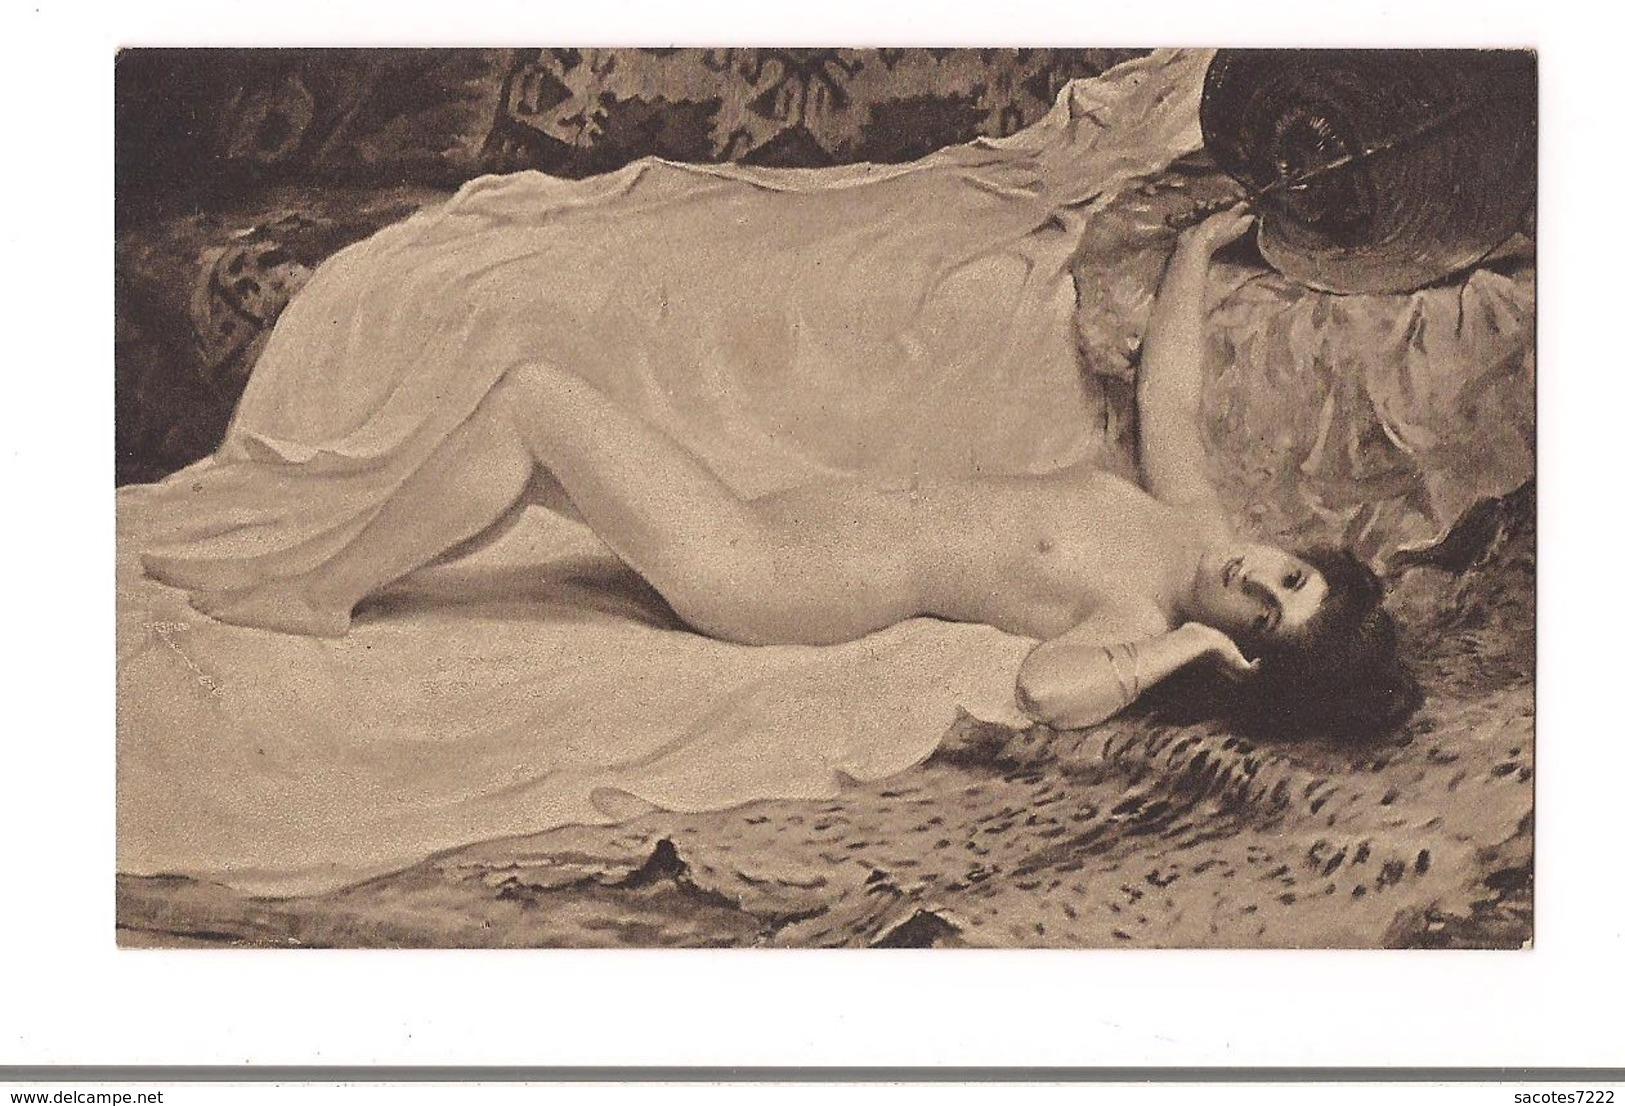 FEMME NUE COPIE DE TABLEAU -  DUFAUX : Phantasie -  (Moderner Kunstverlag Berlin) 5014/3 - Tableaux